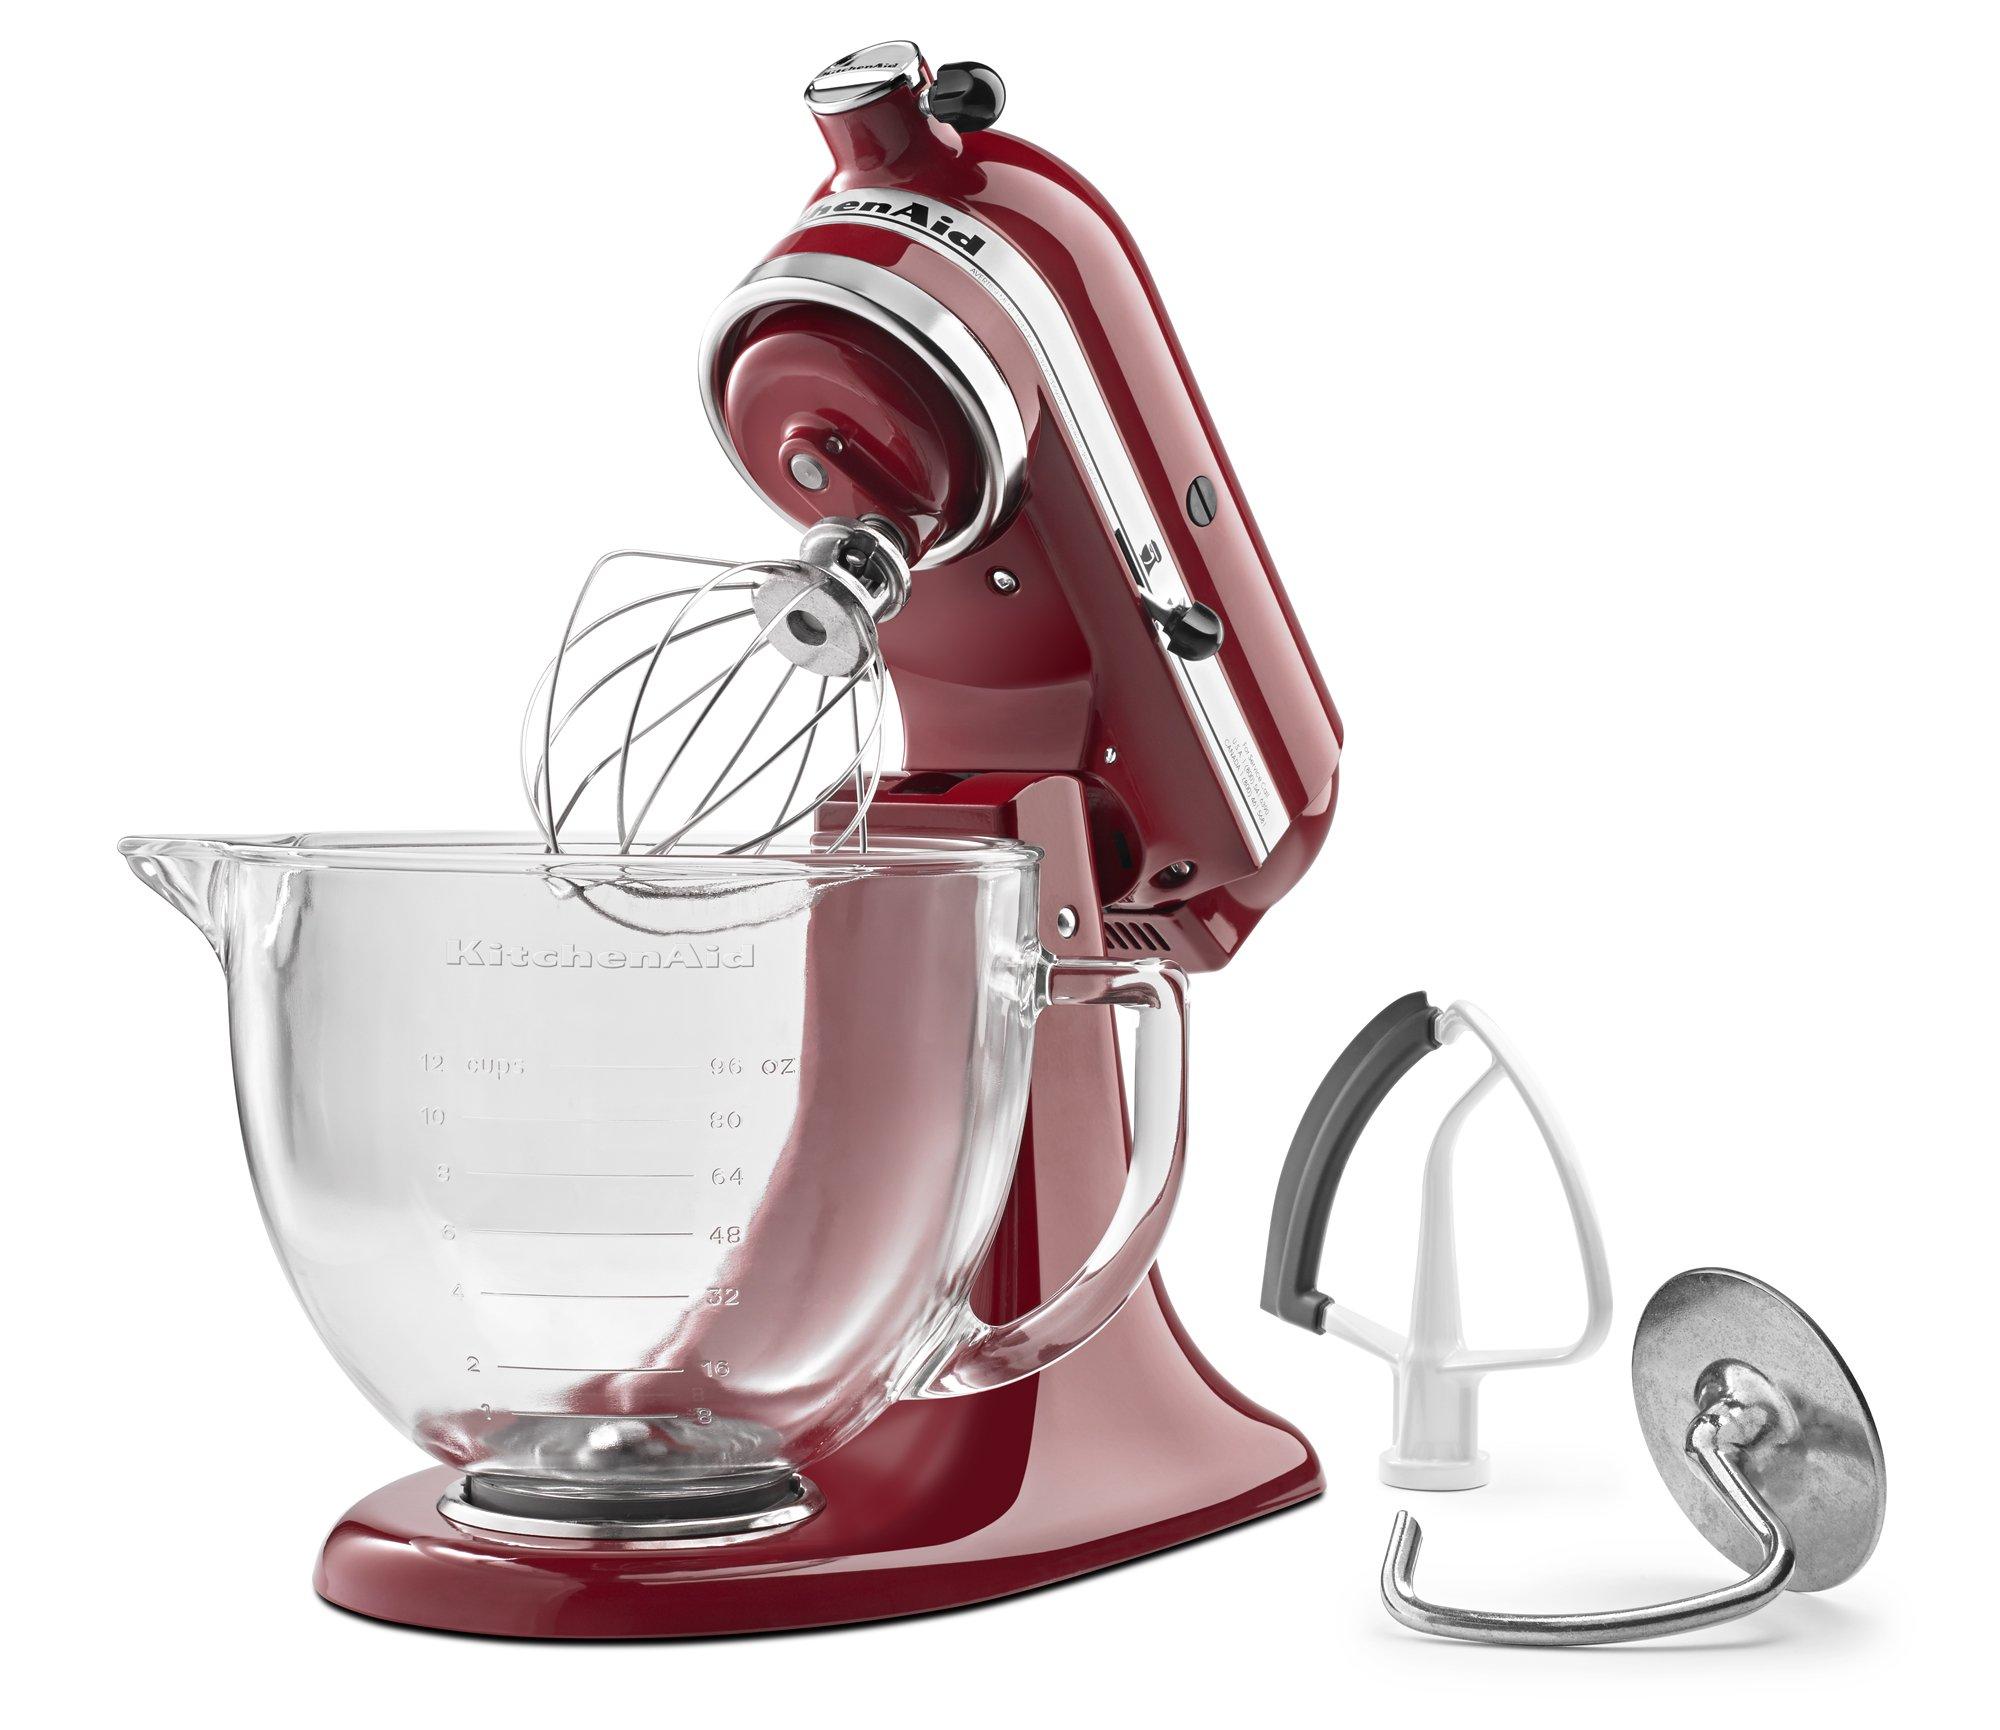 KitchenAid KSM105GBCER 5-Qt. Tilt-Head Stand Mixer with Glass Bowl and Flex Edge Beater - Empire Red